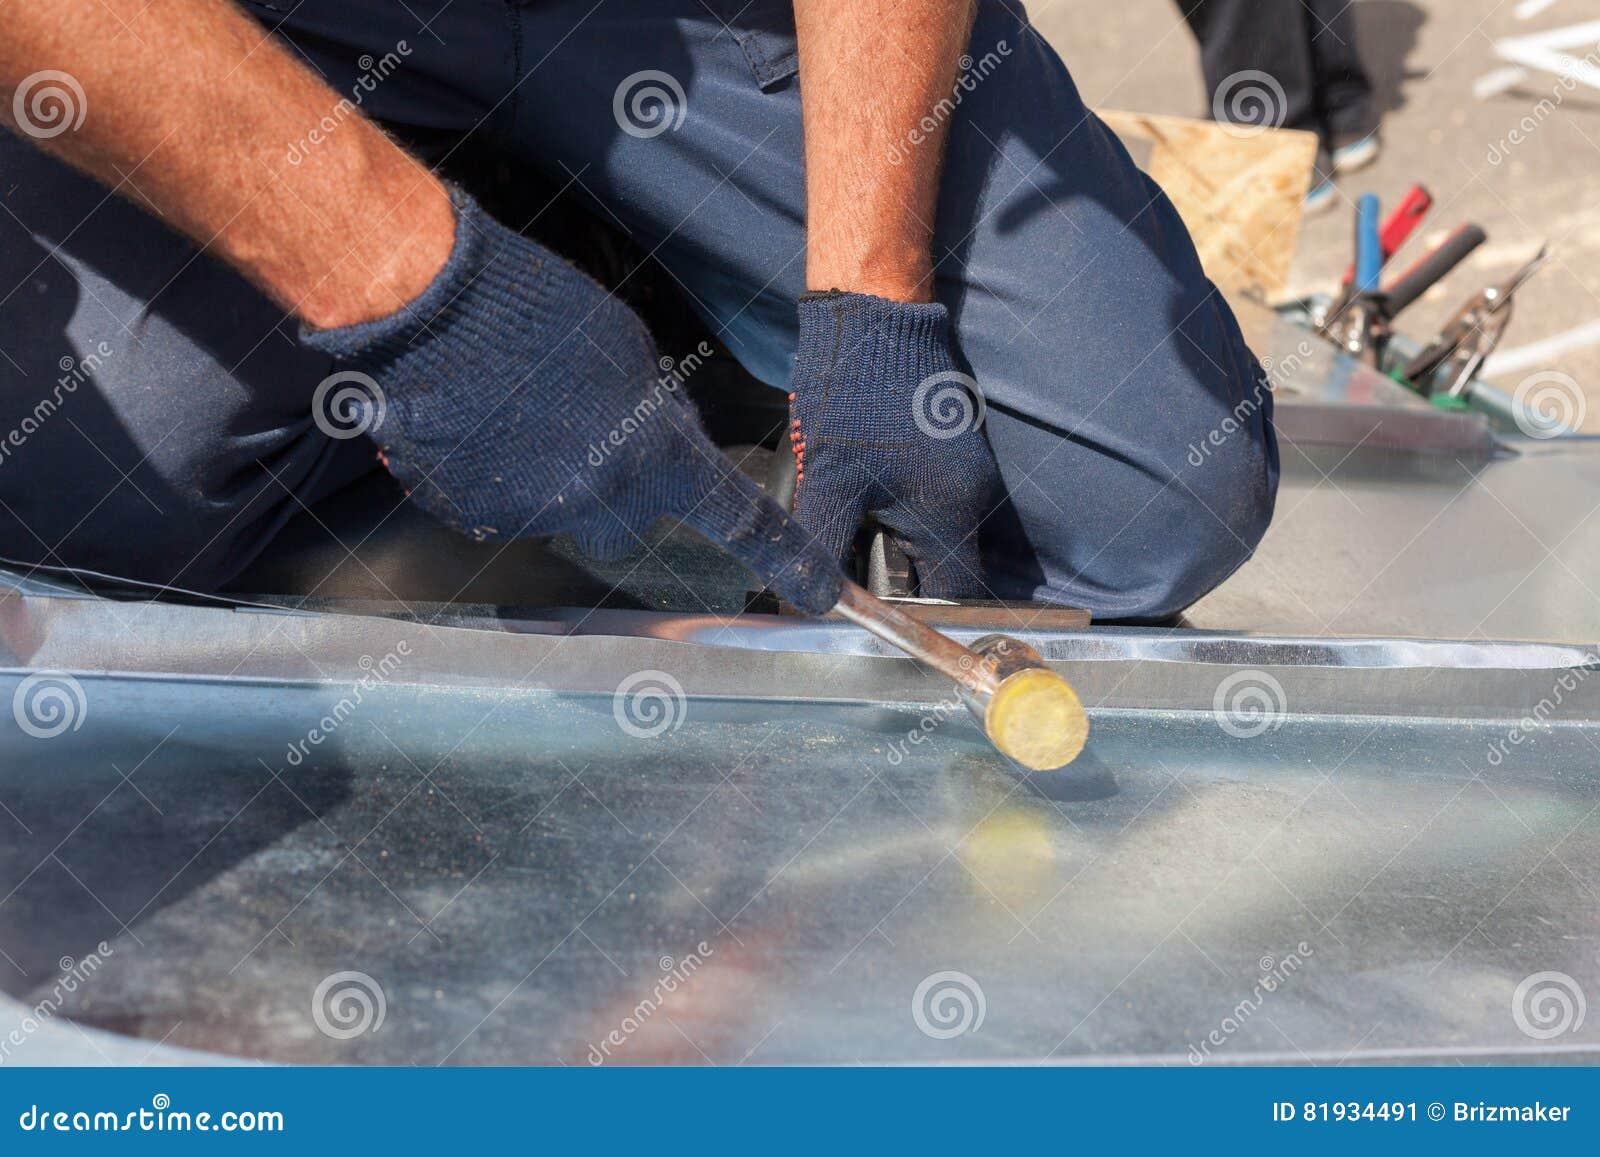 Roofer builder worker finishing folding a metal sheet using rubber mallet.